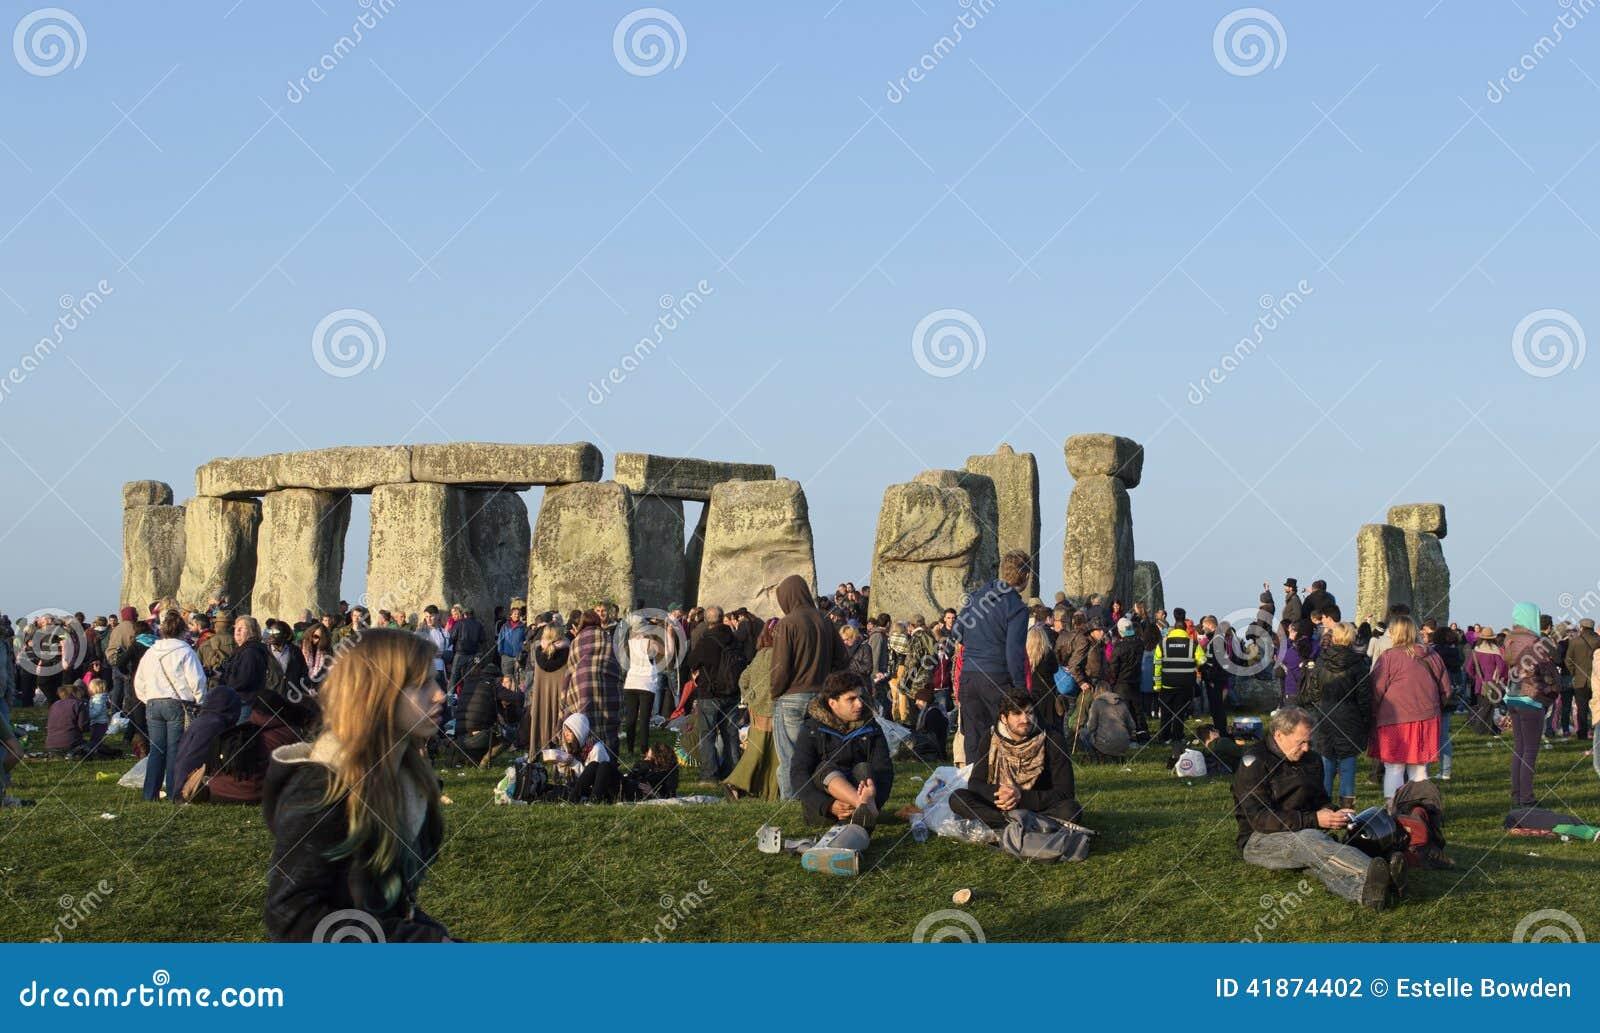 Solstice morning at Stonehenge